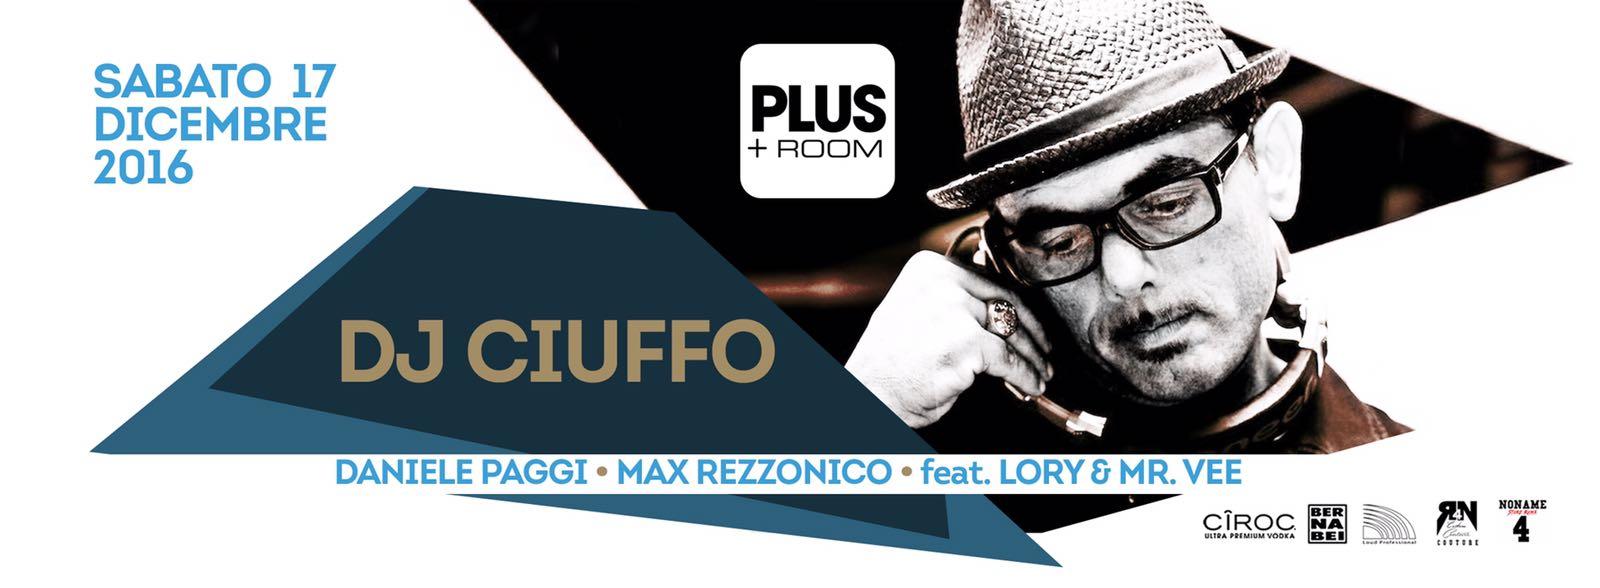 Dj Ciuffo suona nella discoteca Room 26 sala Plus sabato 17 12 2016